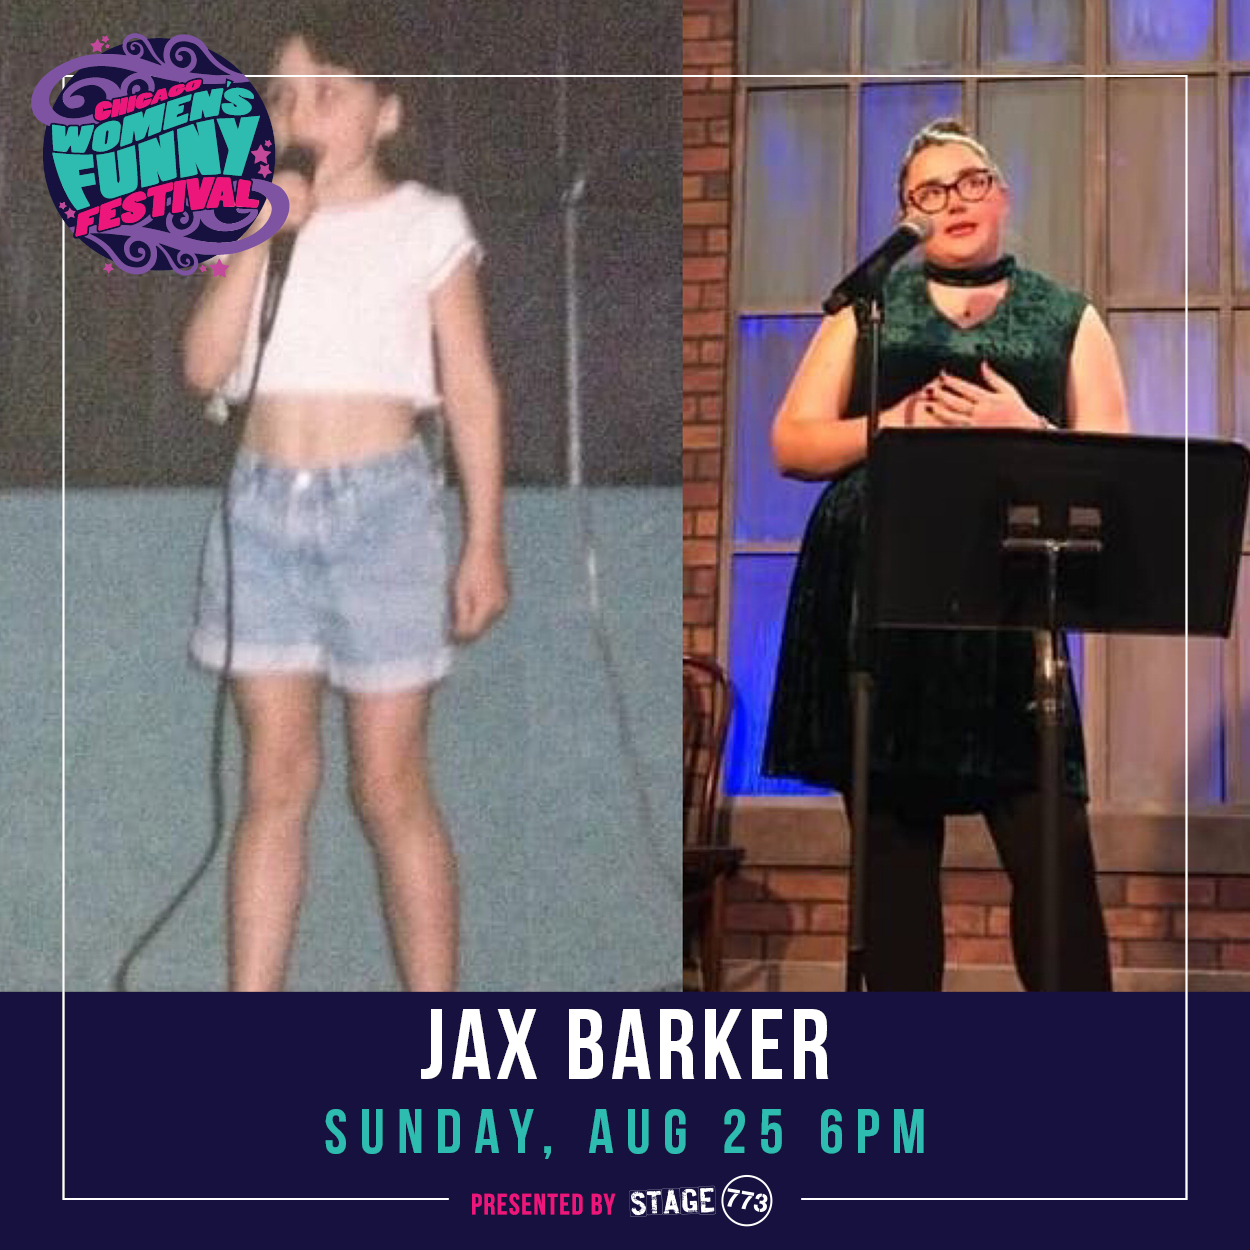 JaxBarker_Sunday_6PM_CWFF20194.jpg